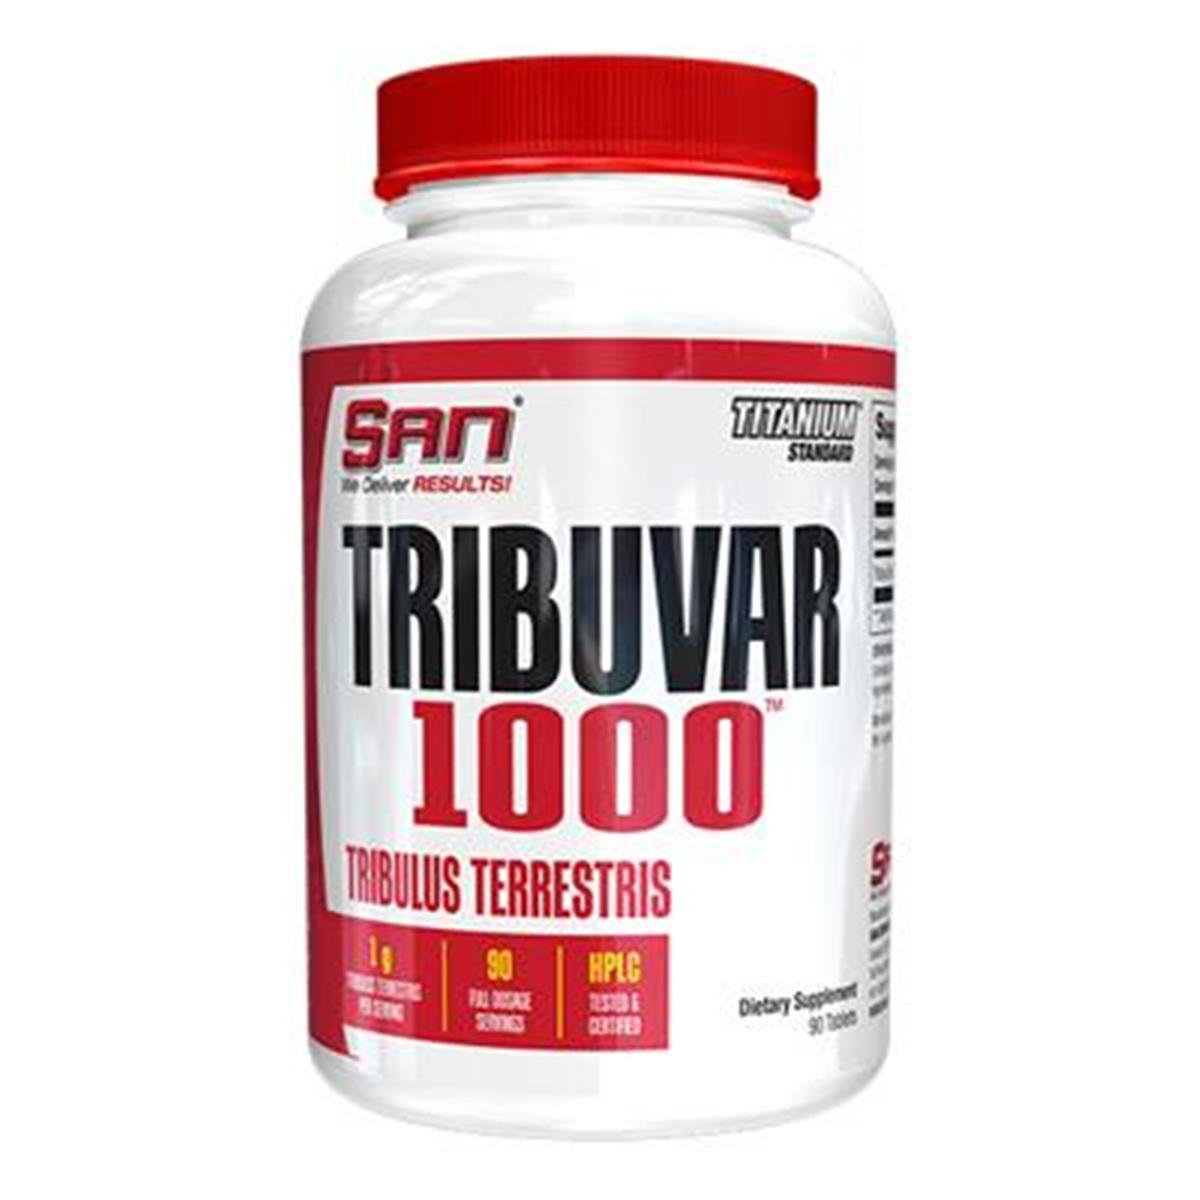 Tribuvar 1000 180 tablets